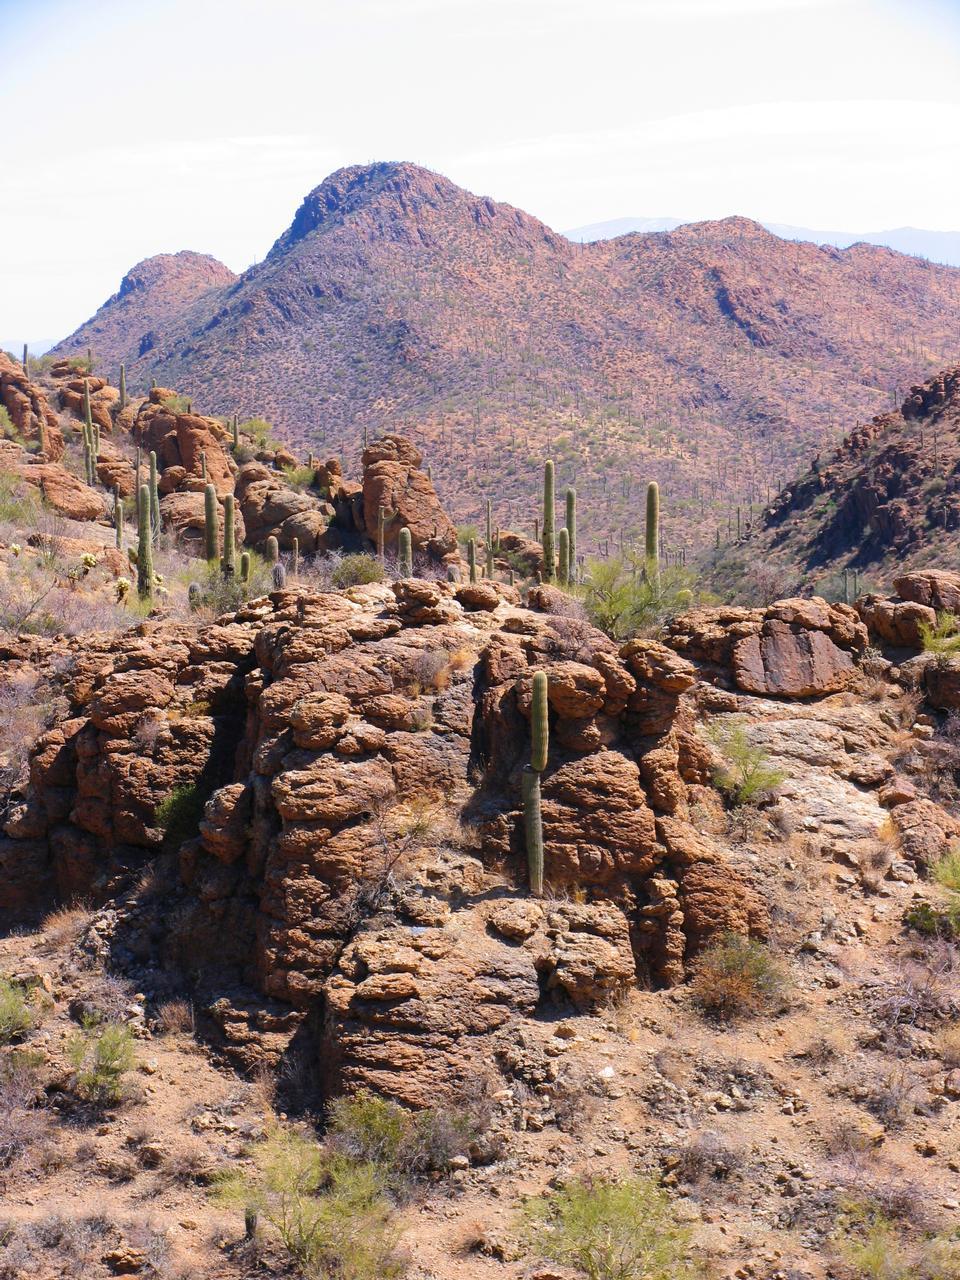 Free Saguaro cactus in the Gates Pass area of Arizona